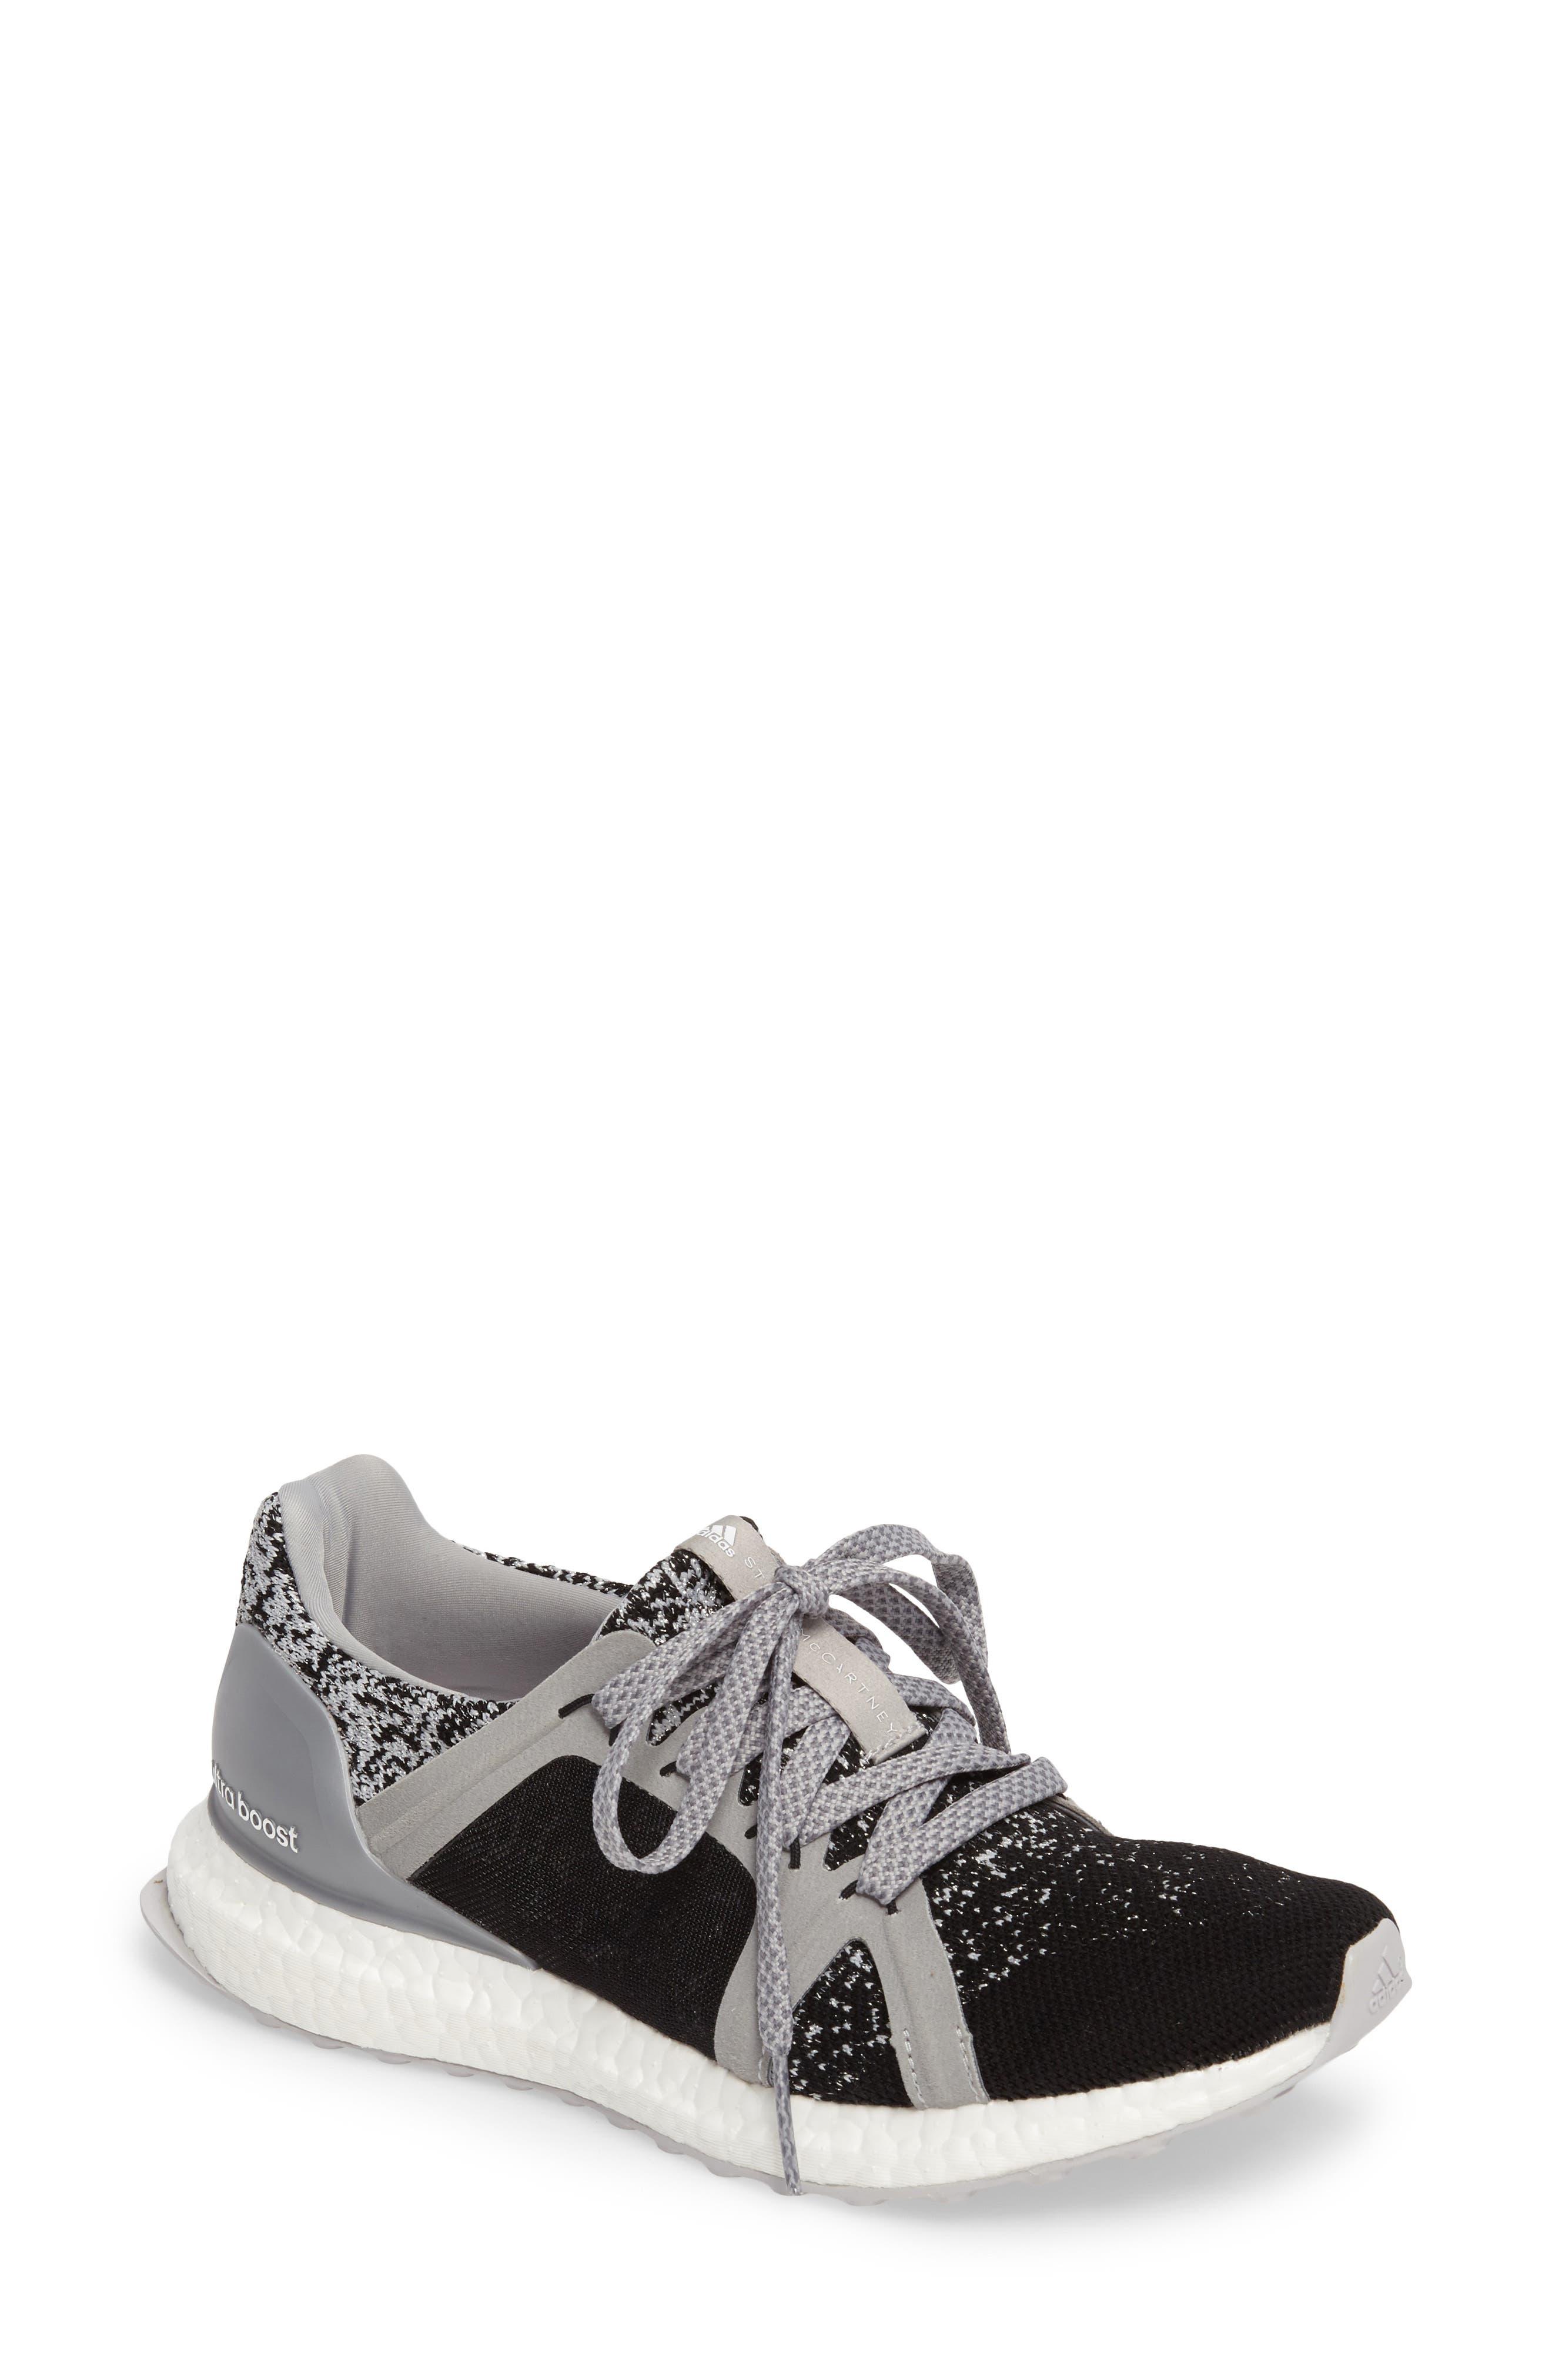 ADIDAS UltraBoost Running Shoe